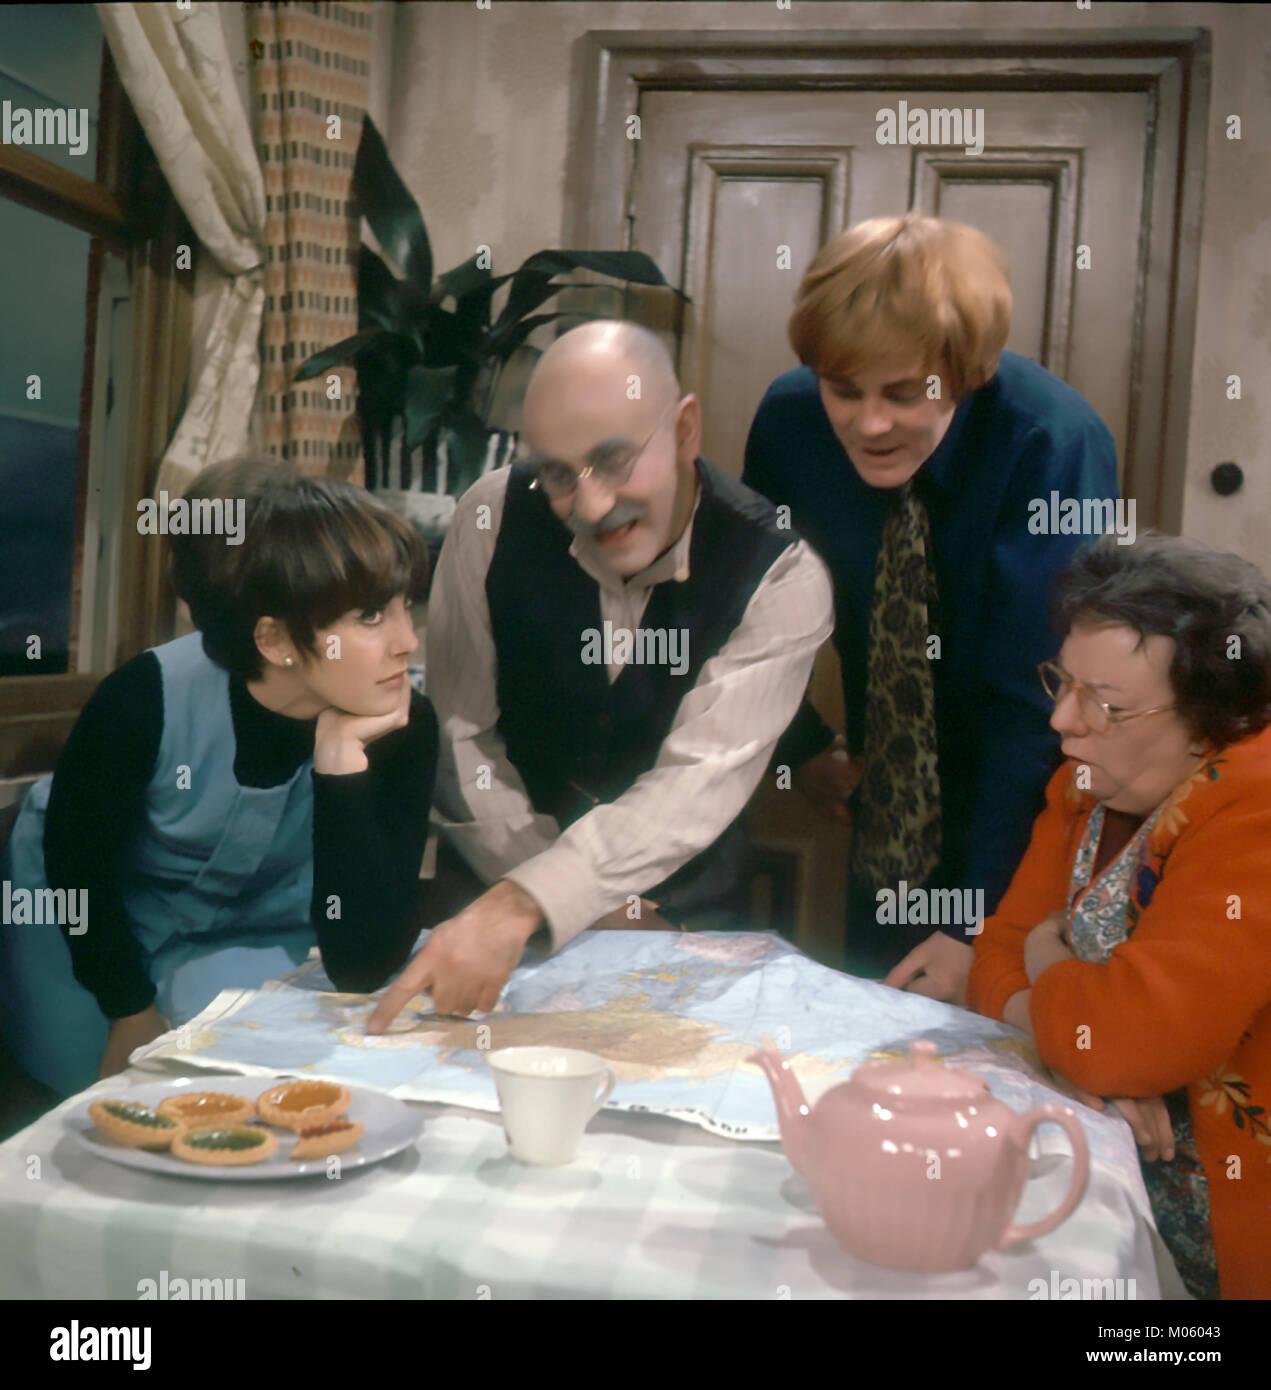 TILL DEATH US DO PART BBC TV series 1965-1975. From left: Una Stubbs, Warren Mitchell, Anthony Booth, Dandy Nicholls. - Stock Image